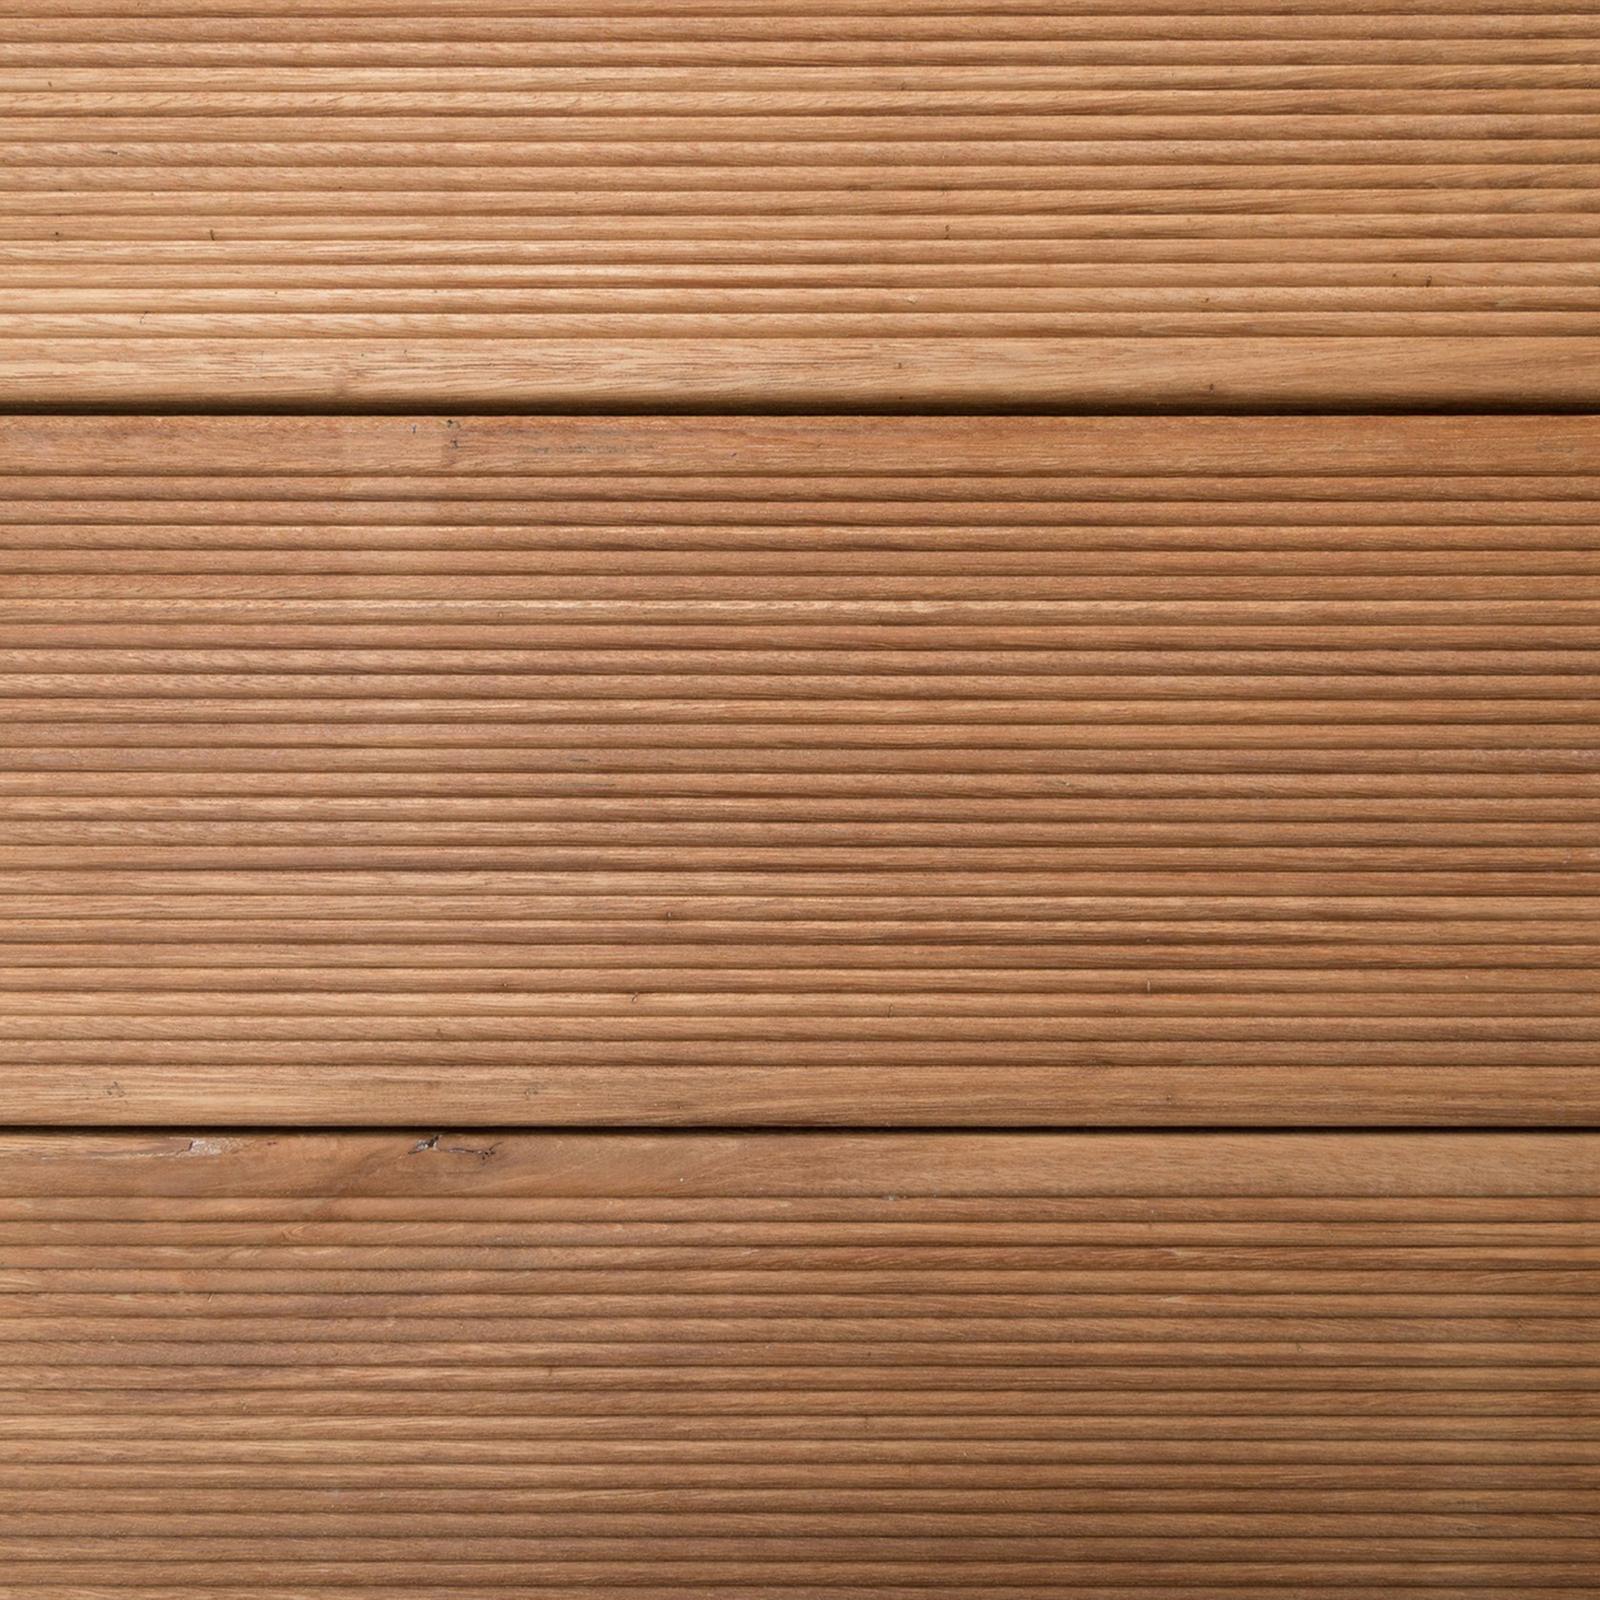 Bangkirai-Terrassendiele-massiv-Holz-grob-Komplettset-Komplettbausatz-5-52-m